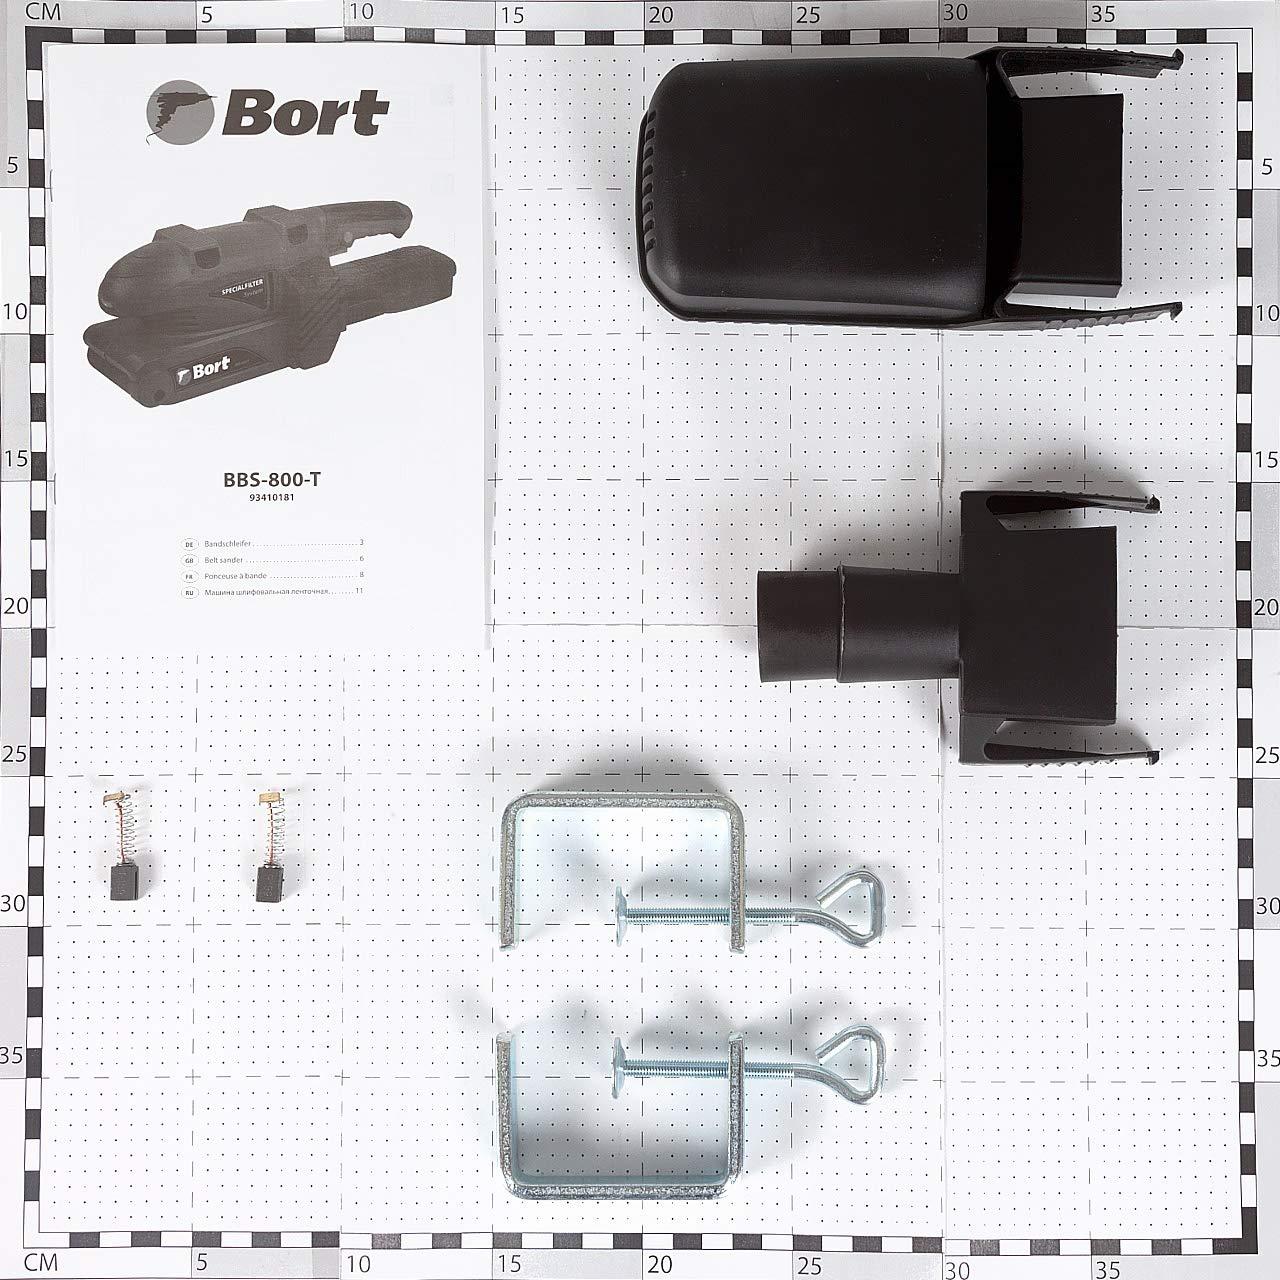 2 Schraubzwingen Schleifband 75X457mm Drehzahlregelung Staubf/änger Staubsauger Adapter 170-250rpm Bort Bandschleifer BBS-800-T 750 Watt Betrieb im Station/äreinatz inkl